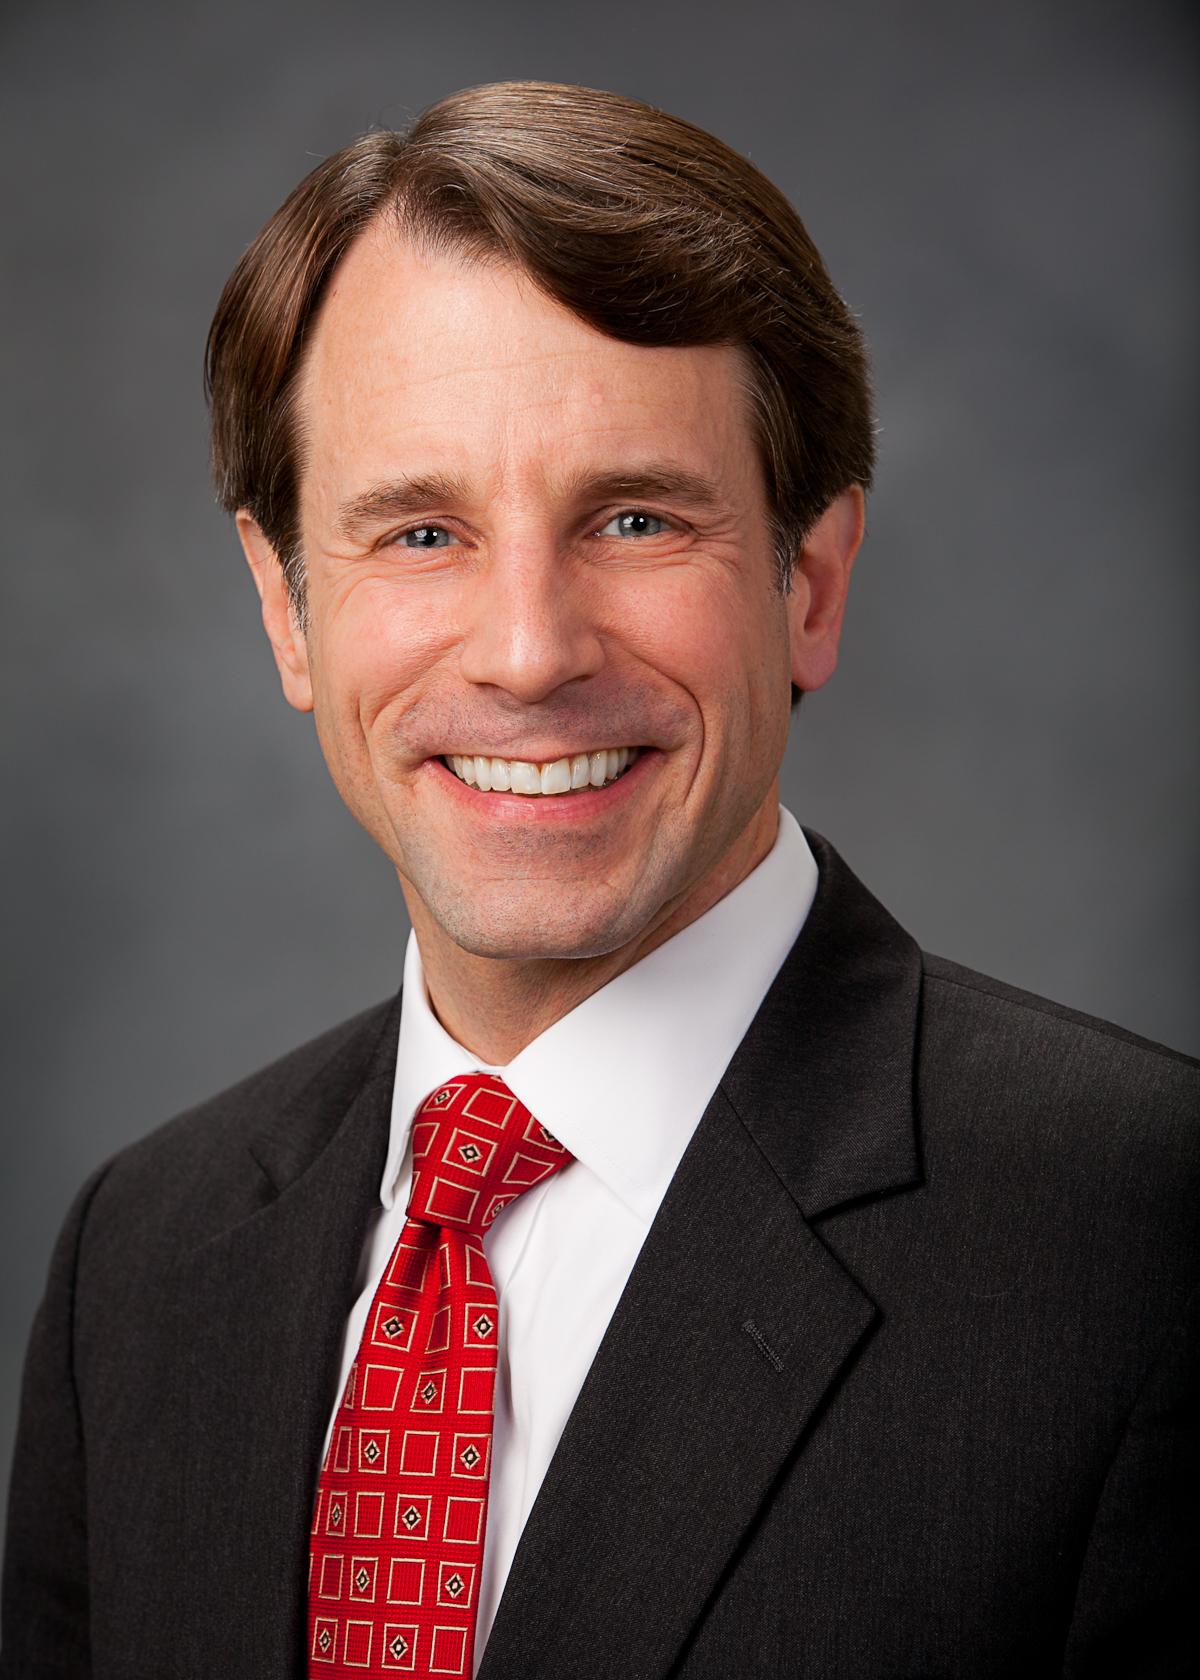 insurance commissioner of california photo - 1